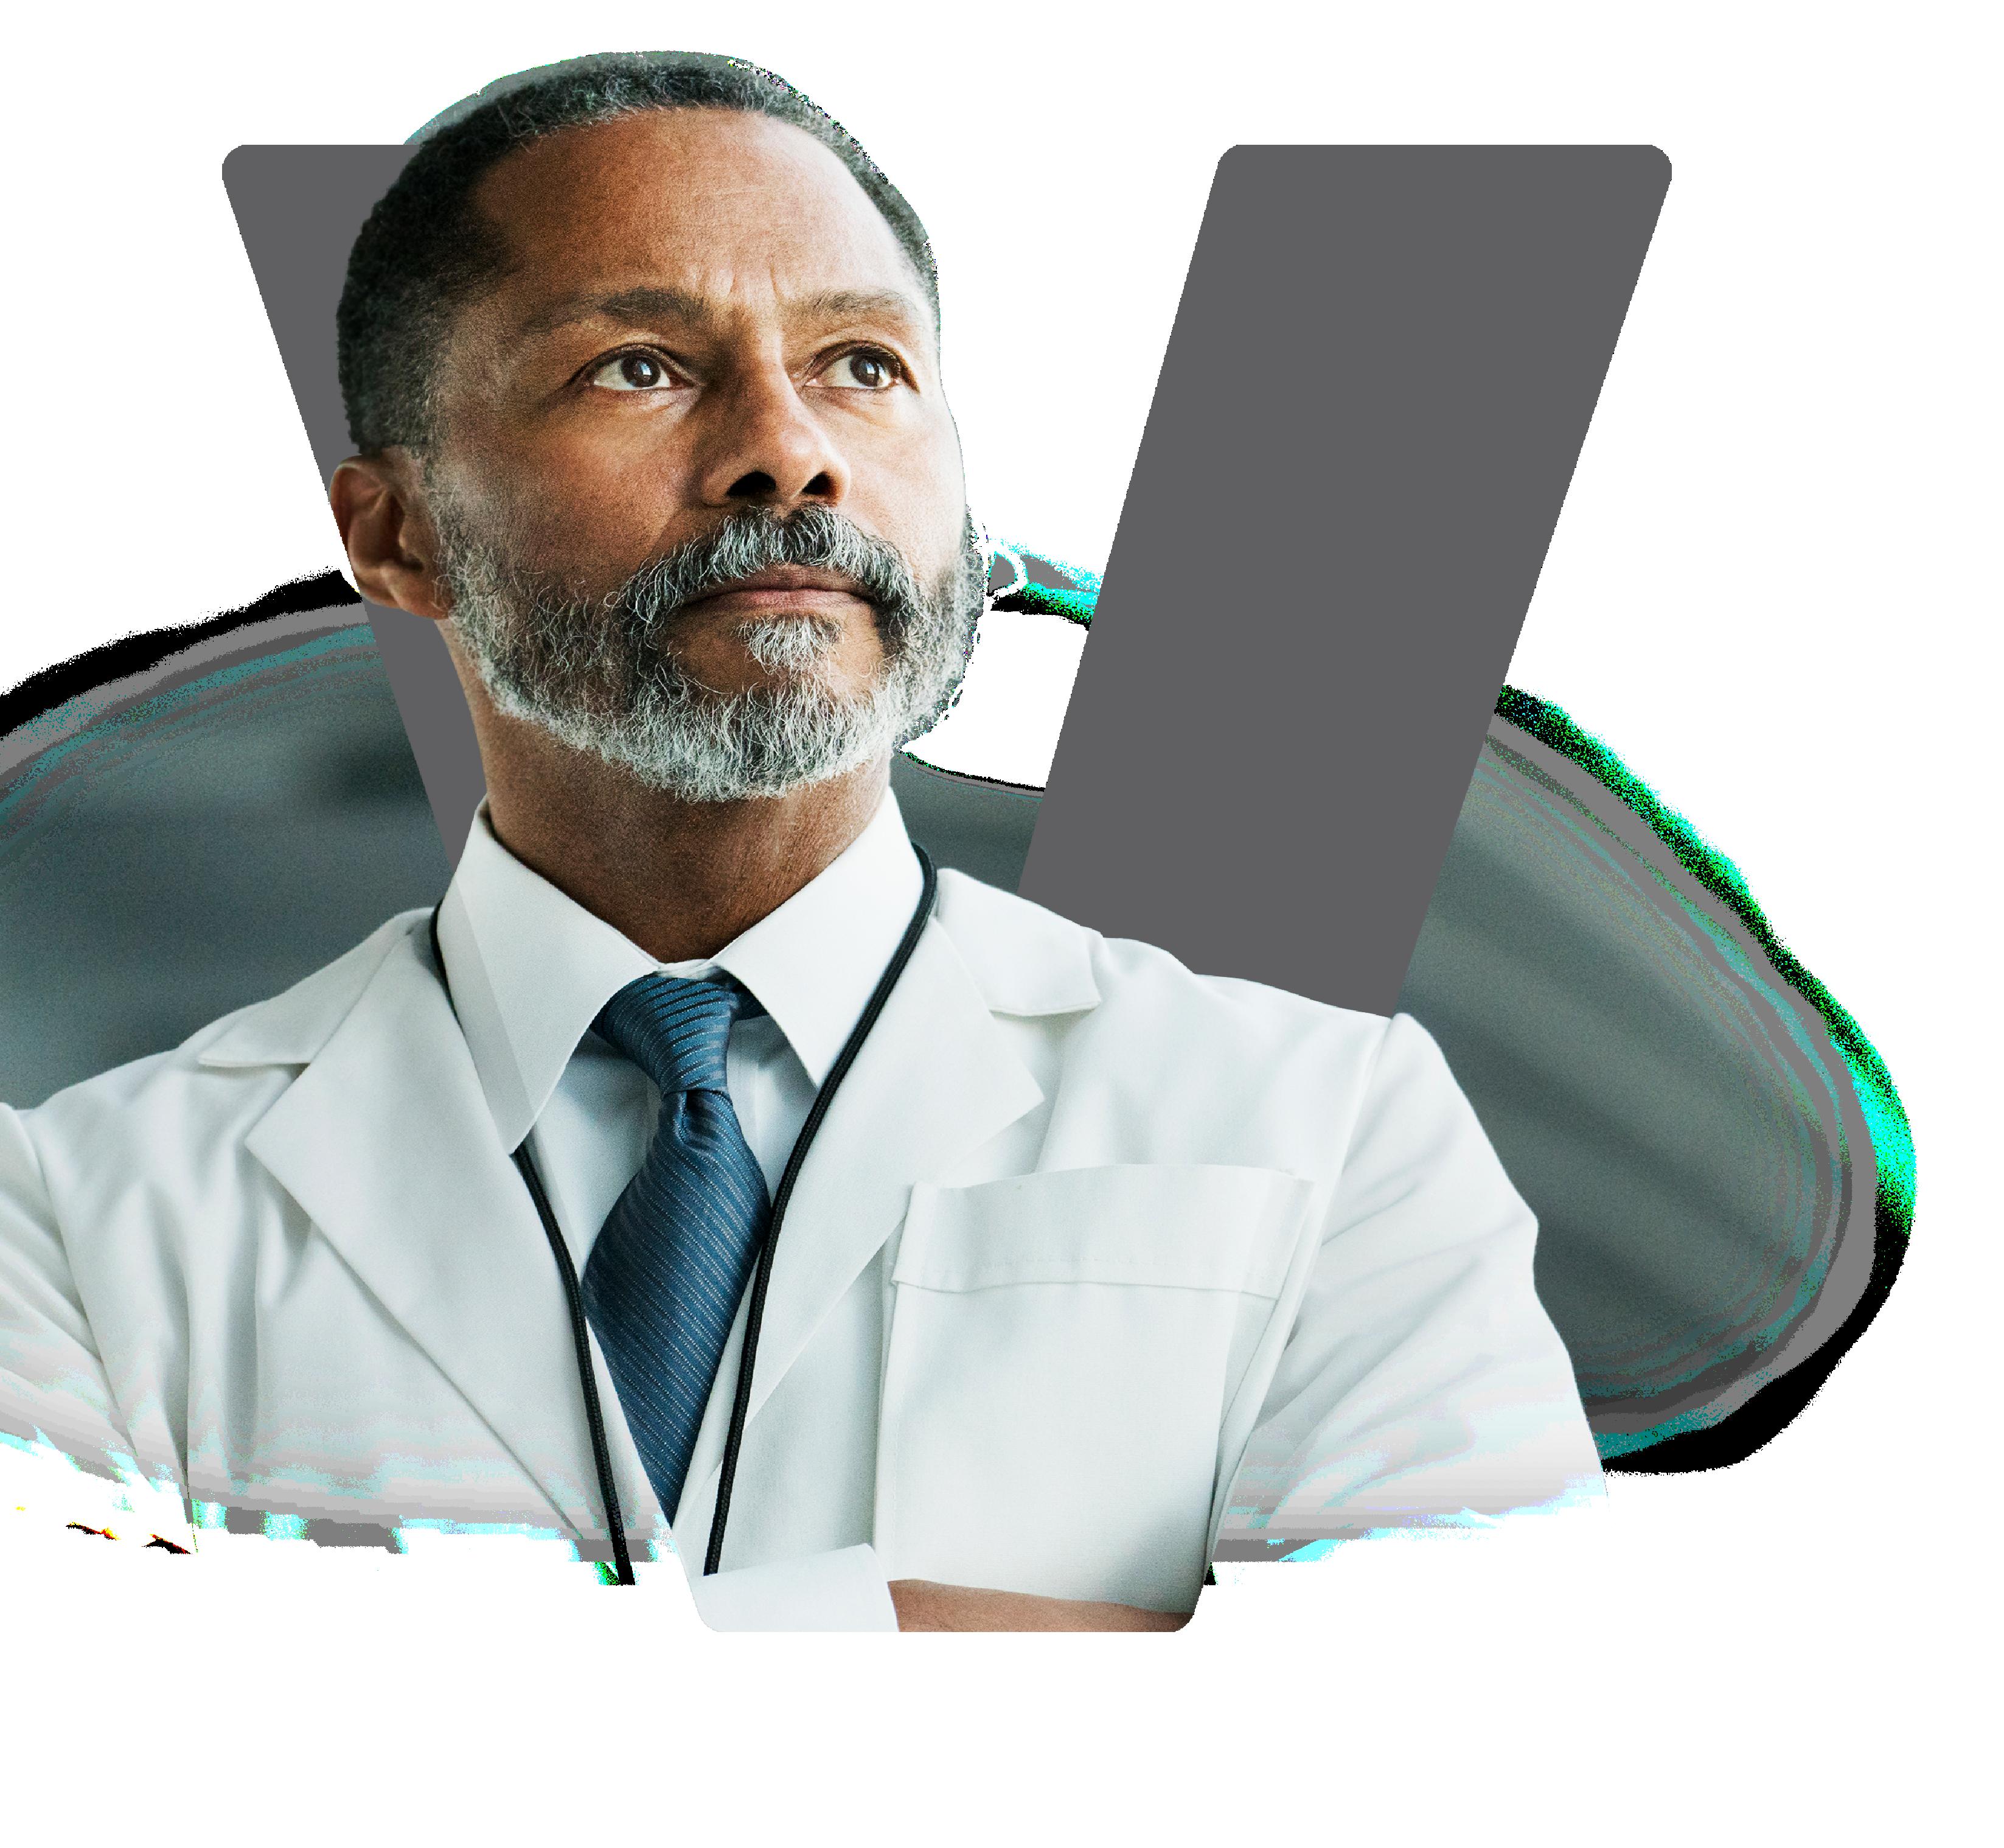 Vivity Surgeon